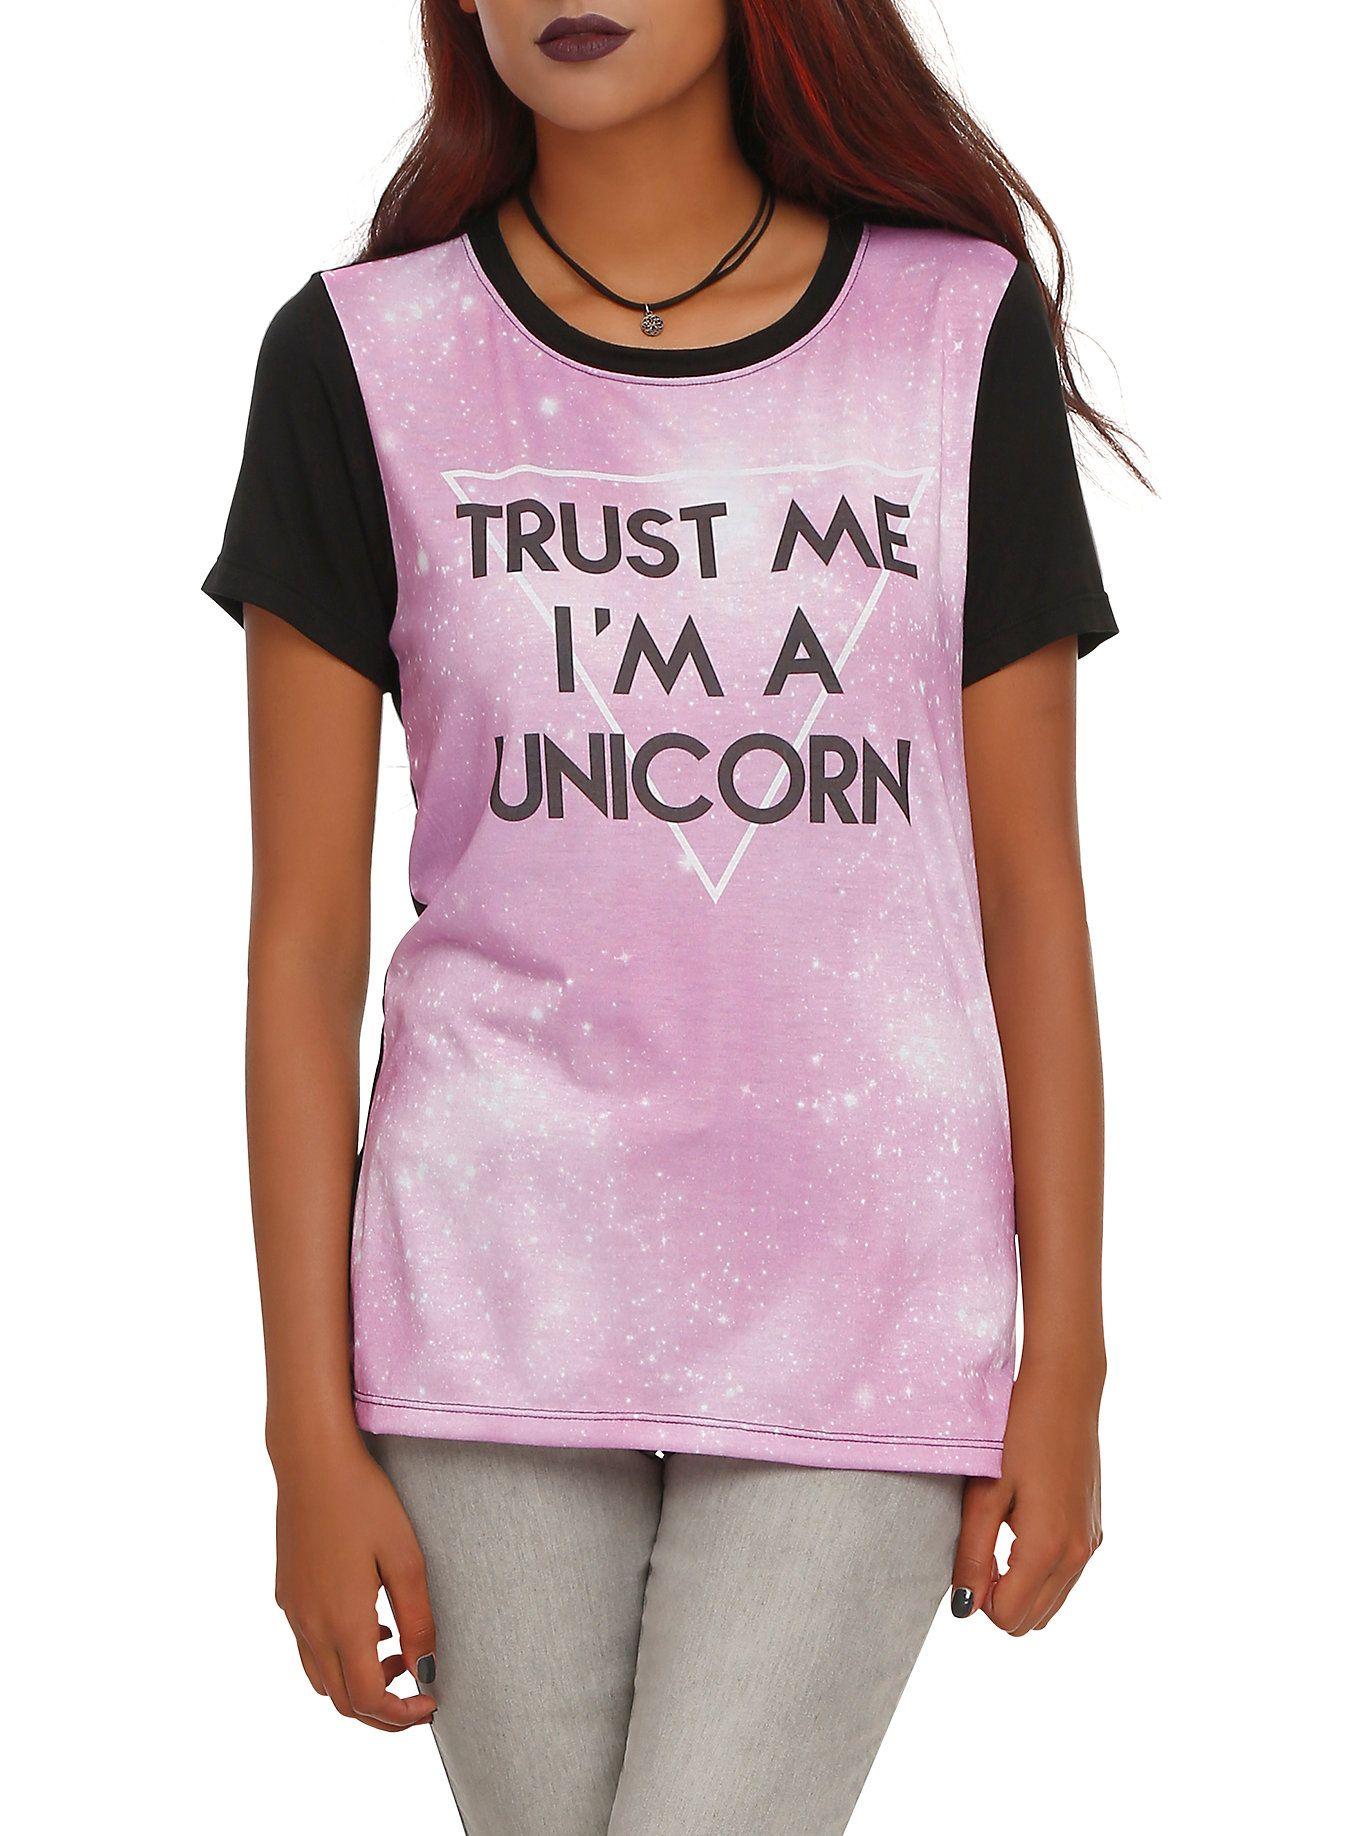 Unicorn Galaxy Girls T-Shirt   Hot Topic